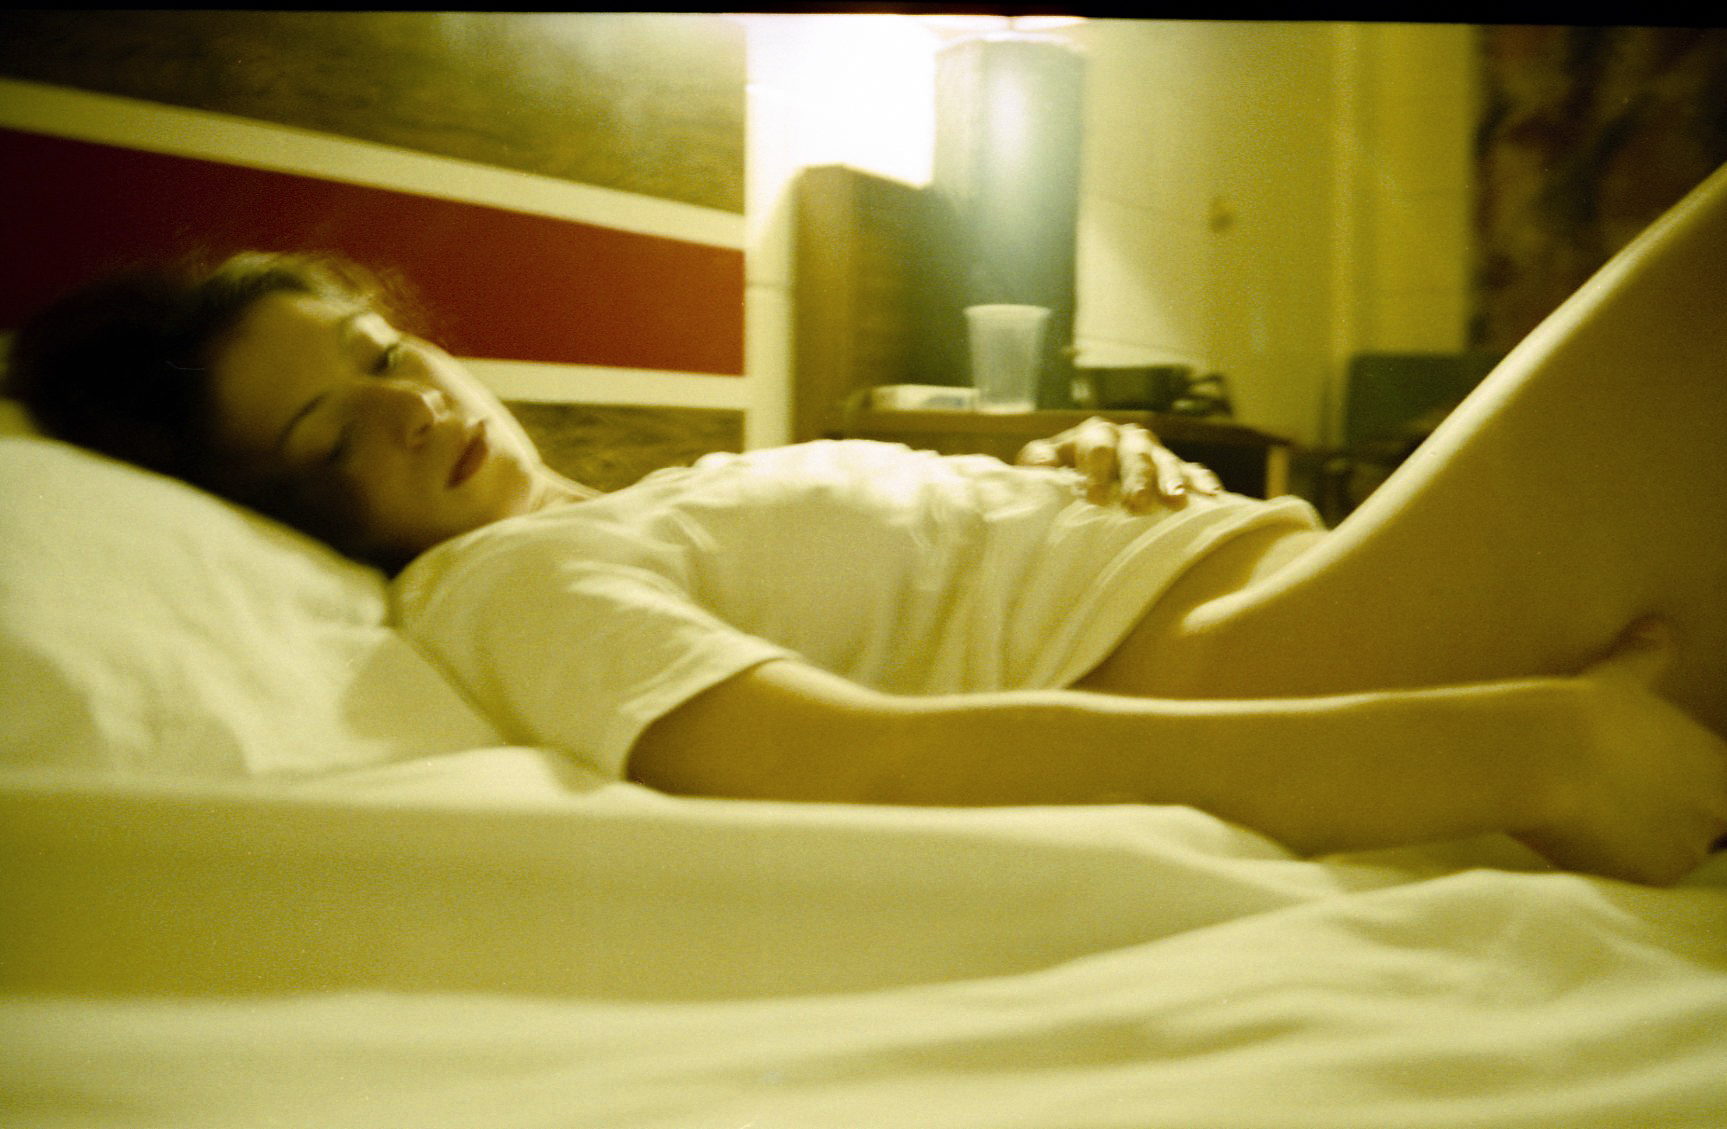 GTrimble-hotel-Hannah-2002.jpg